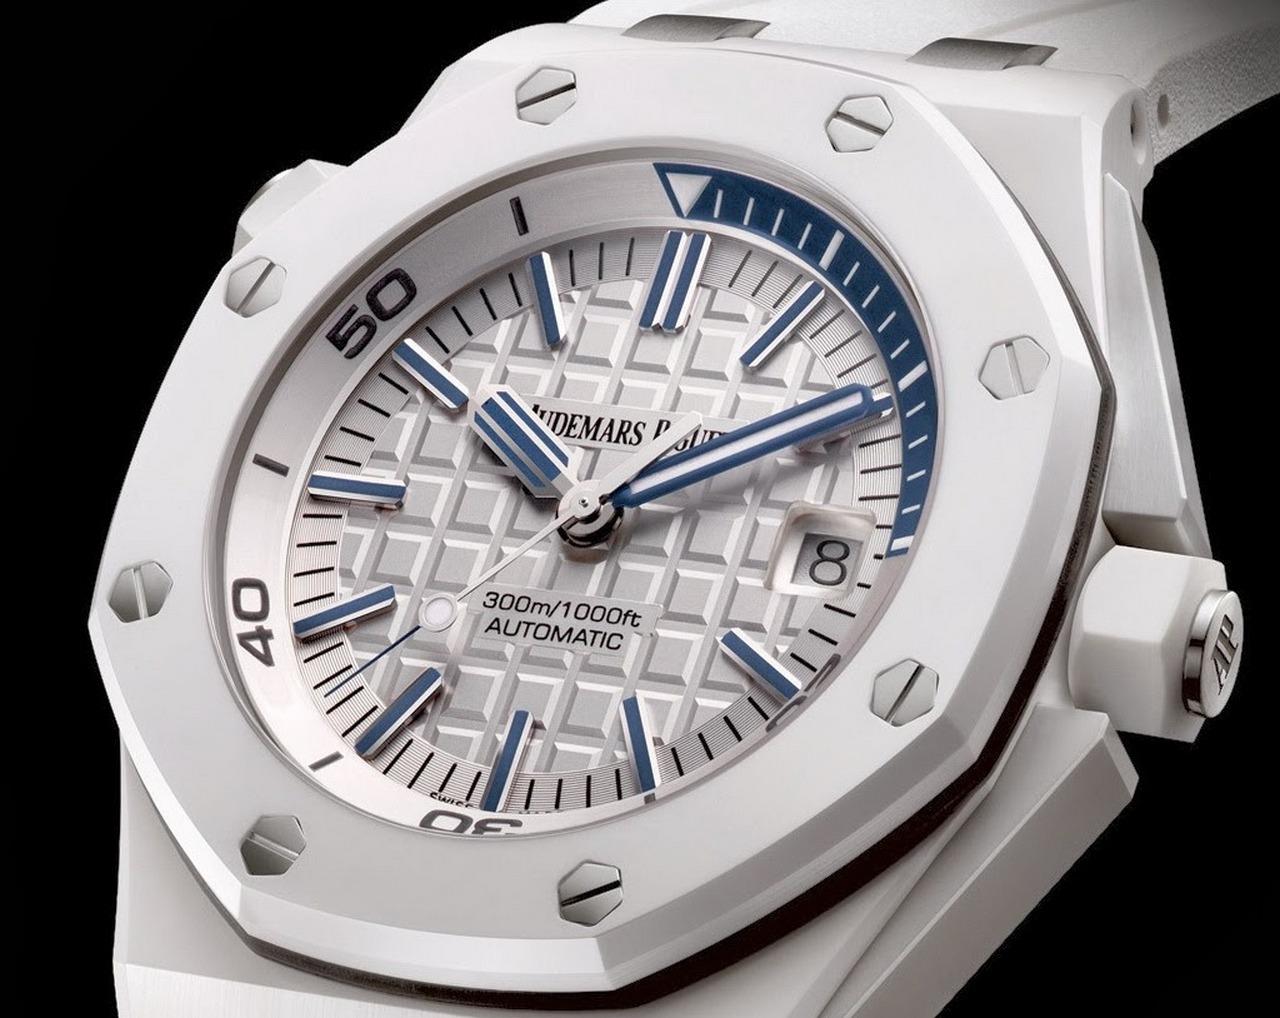 sihh-2014-audemars-piguet-royal-oak-offshore-diver-white-ceramic-prezzo-price_0-100_3